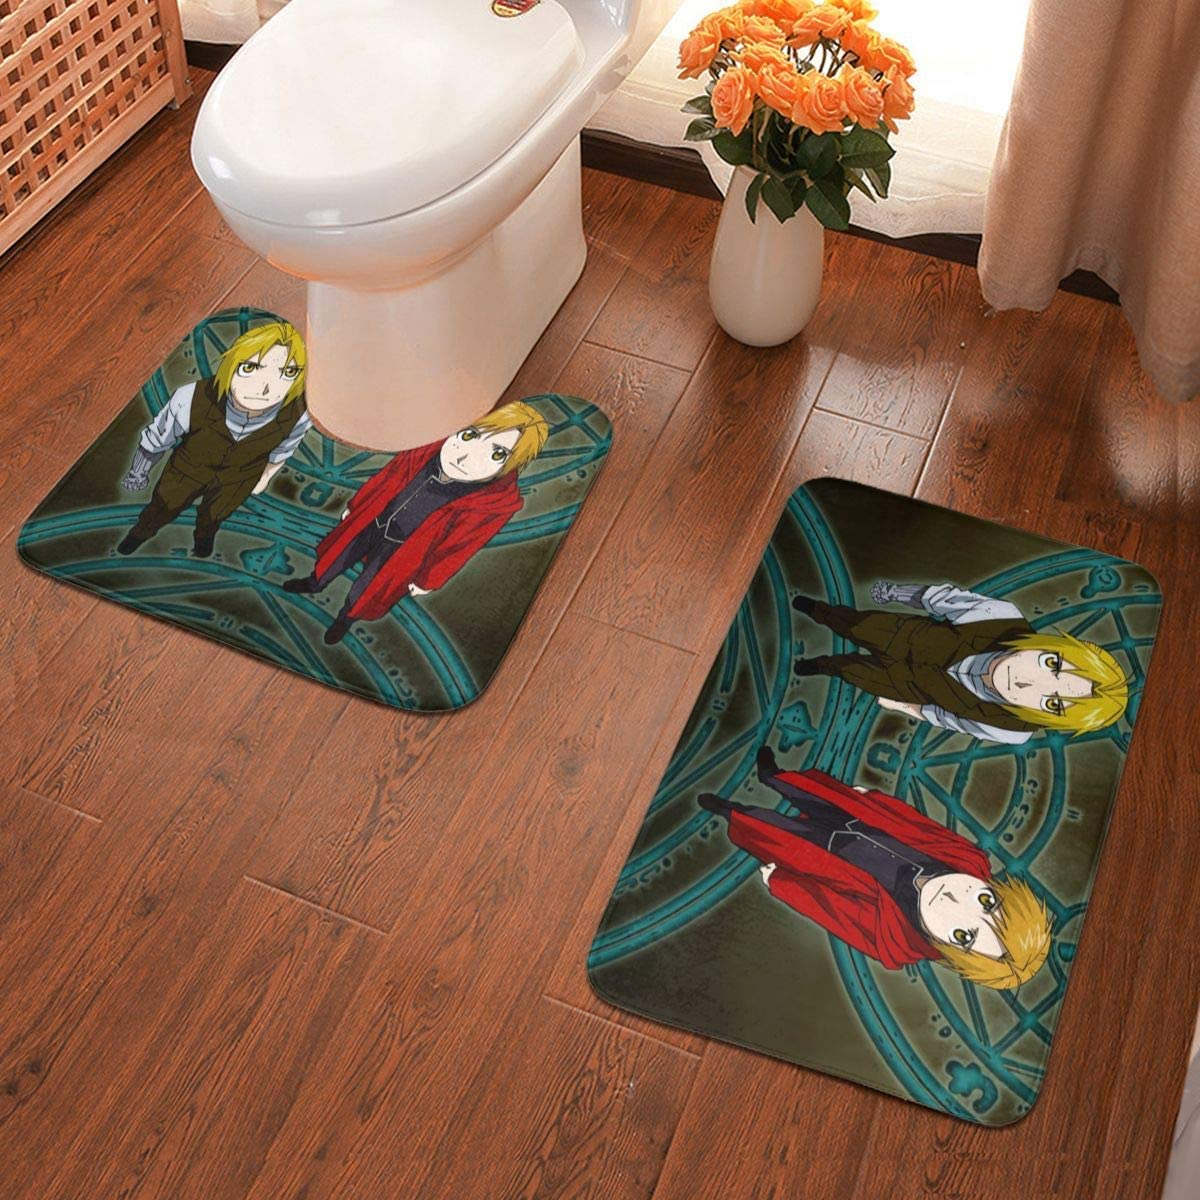 Boweike Fullmetal Alchemist Bathroom Antiskid Pad Non-Slip Bath Carpet Floor Mat Rug 2 Sets -Floor Mat+U-Shaped Pad, Toilet Washable Blanket Mats for Bathroom Home Shower